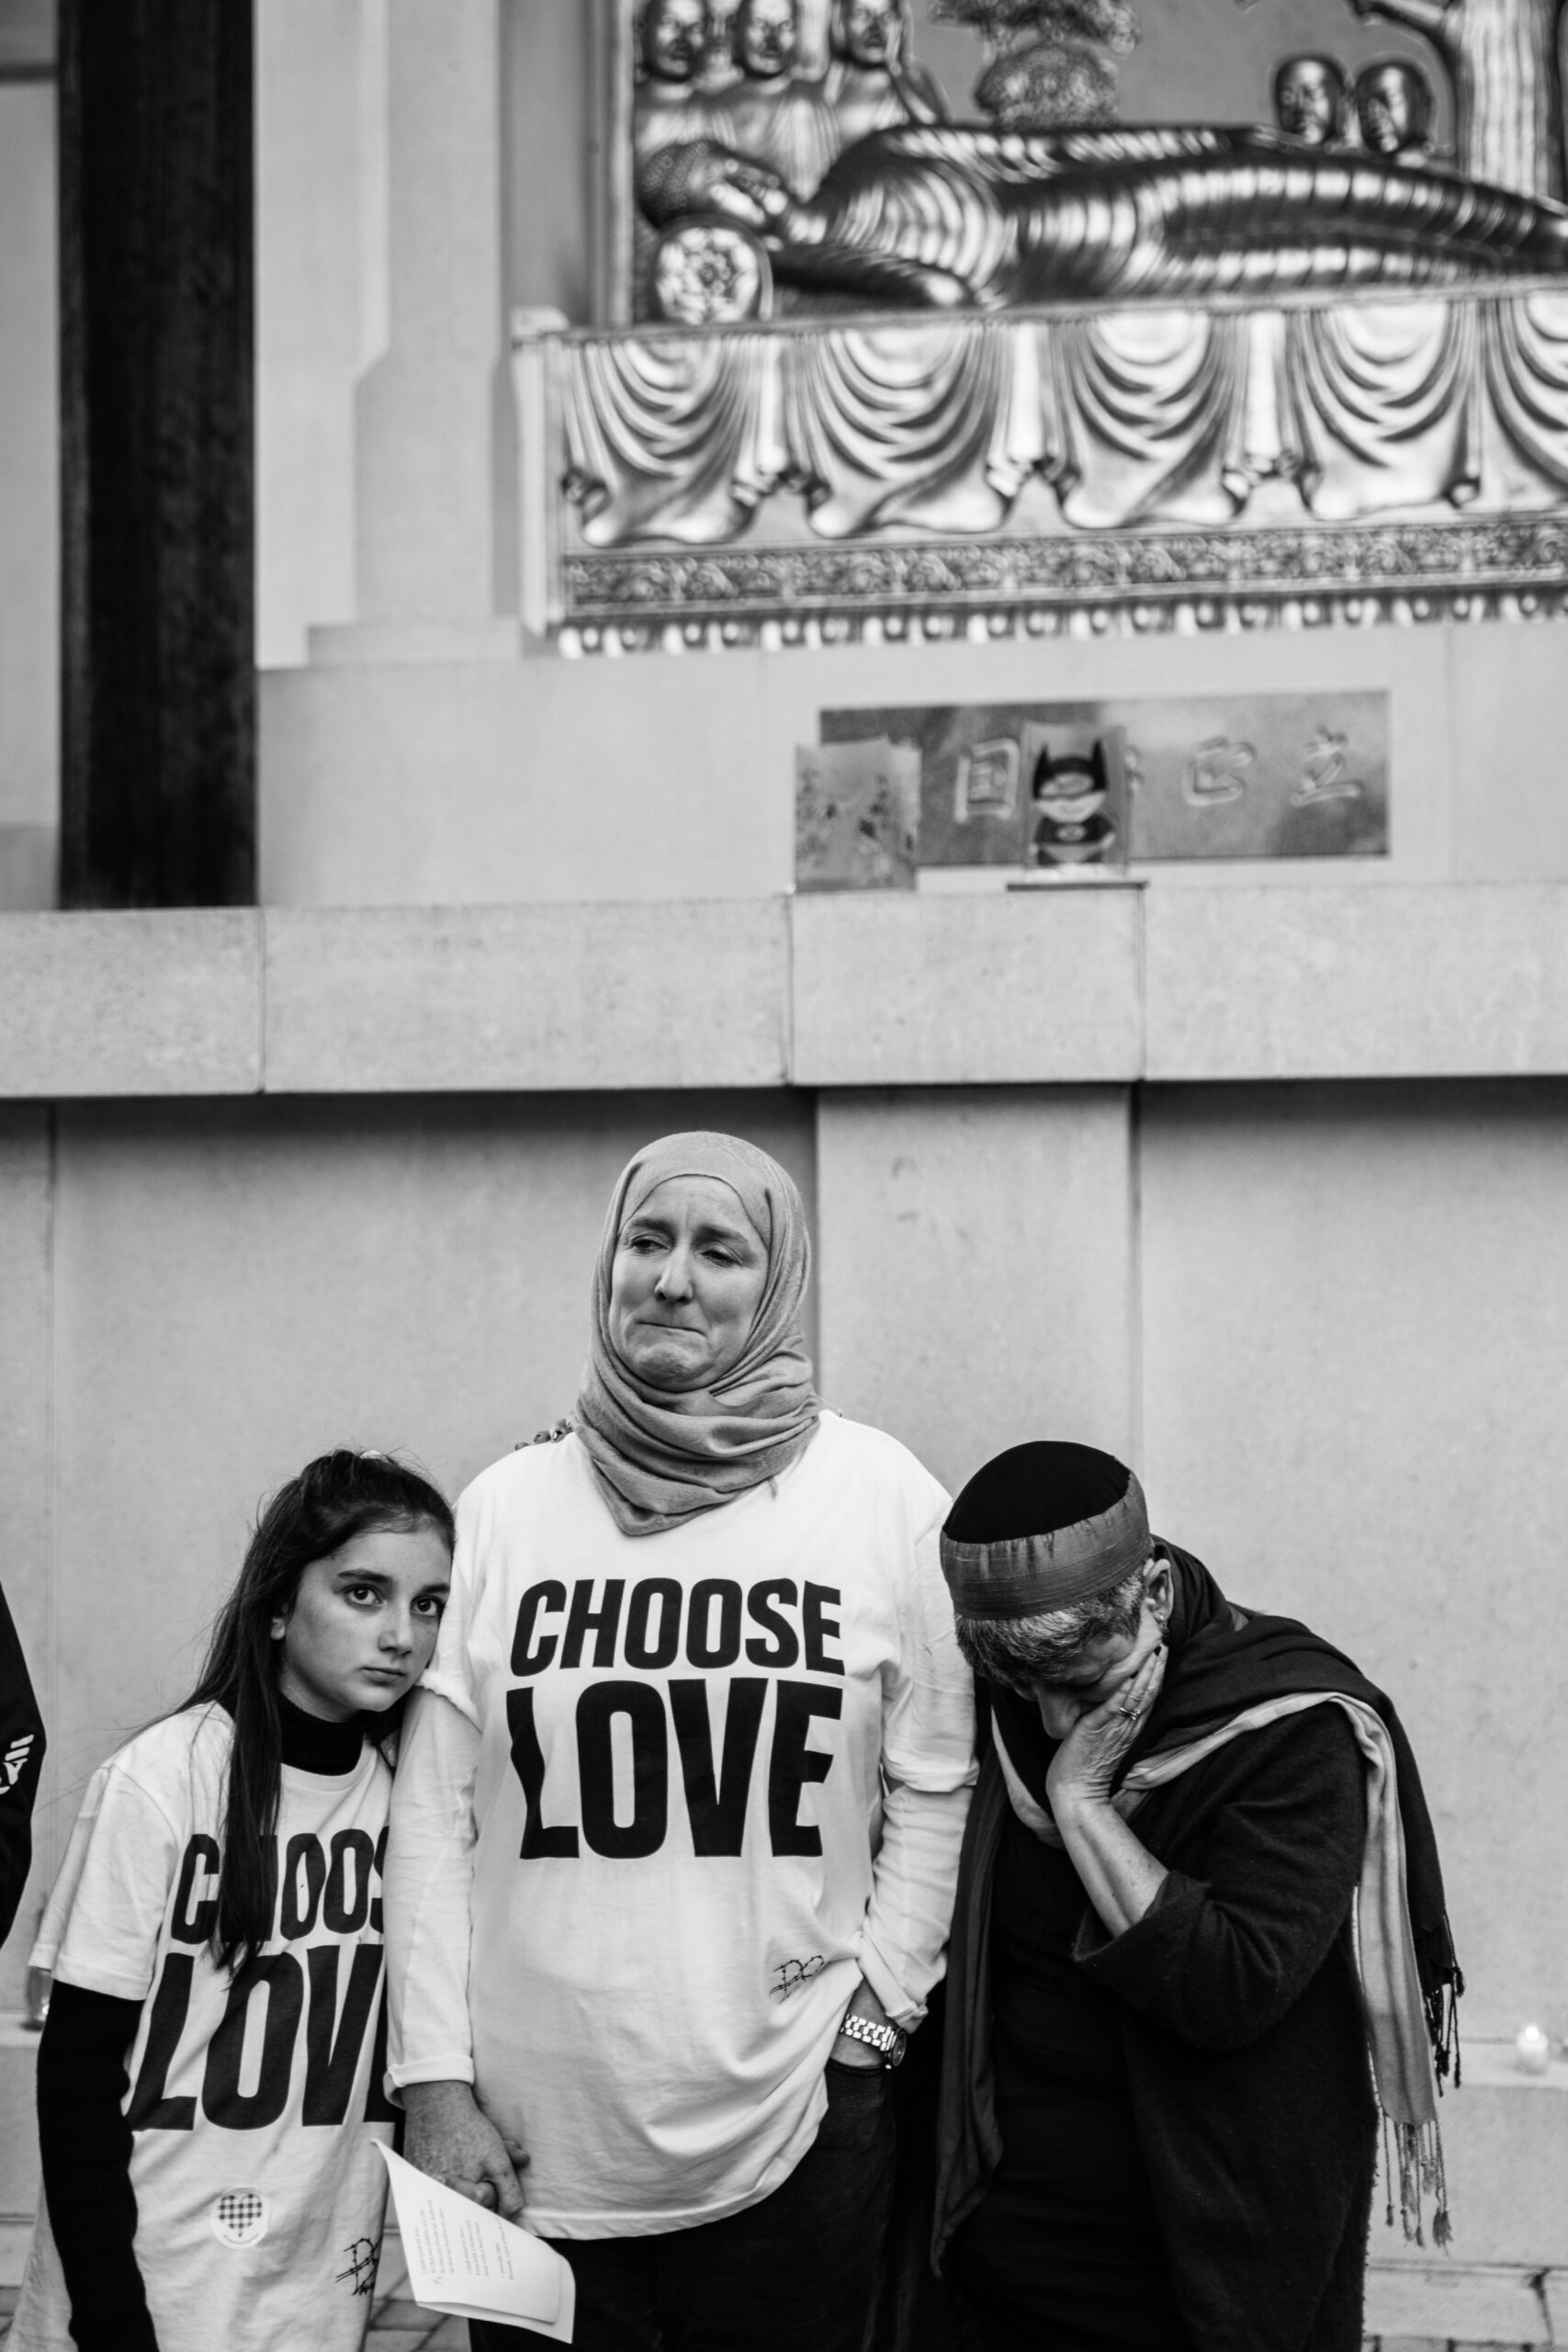 Women's Peace Tribute following London Bridge and Borough Market Attacks